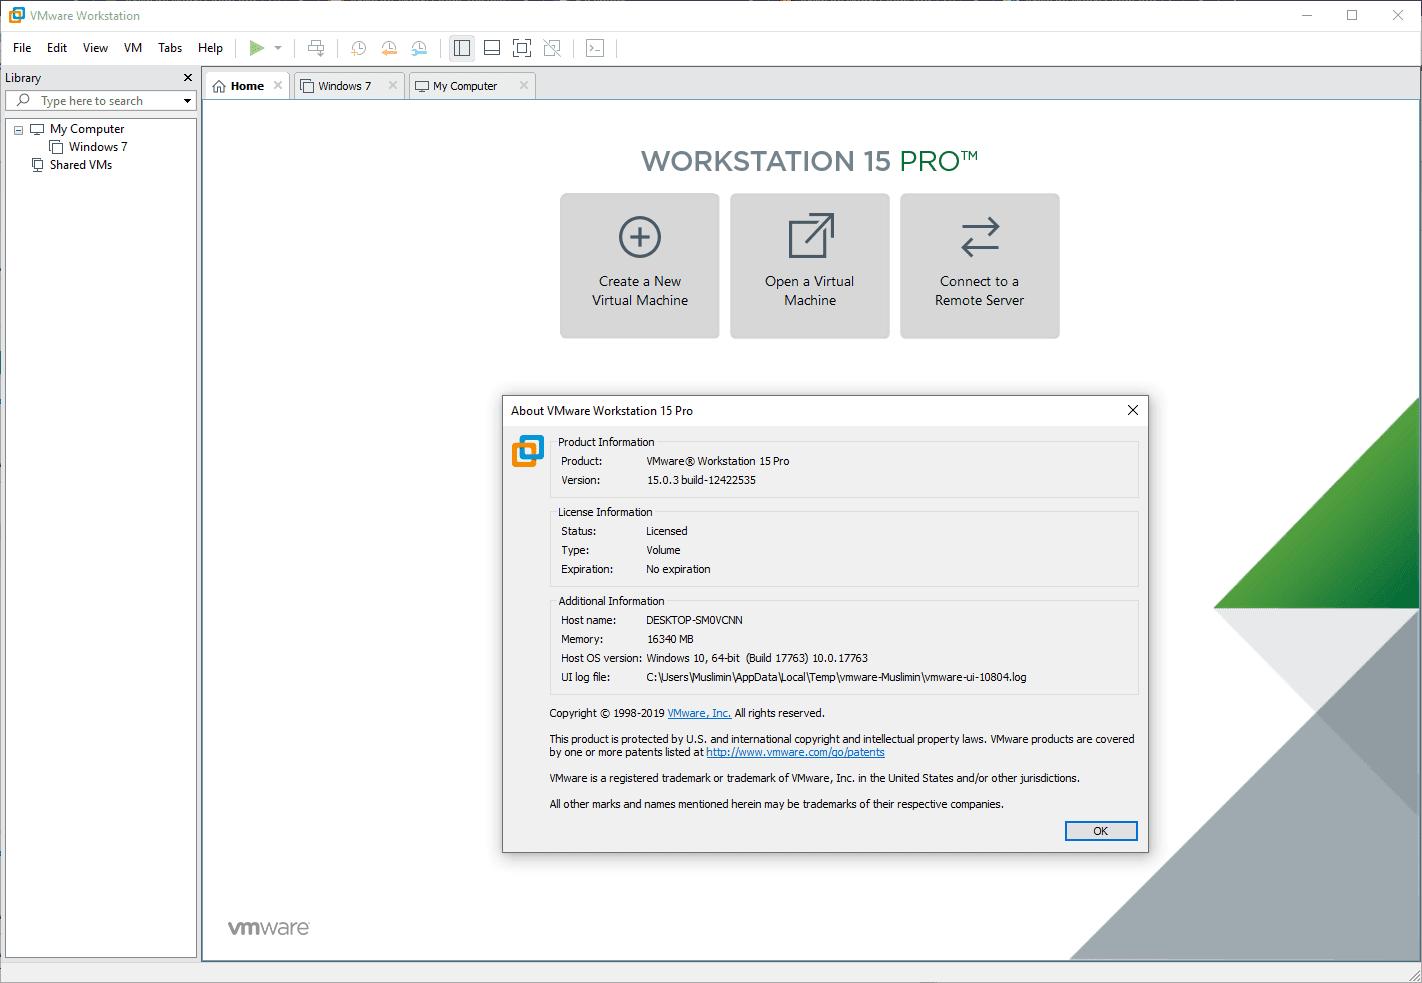 VMware Workstation Pro v15.0.3 Full Version